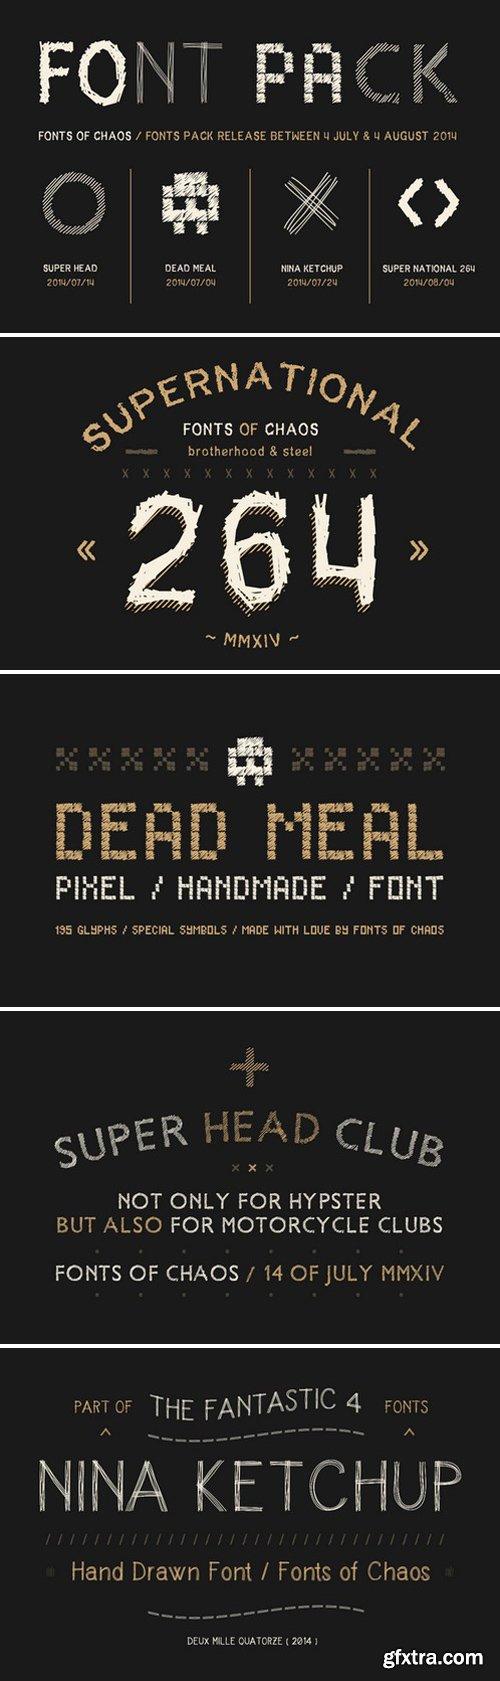 CM - The Fantastic 4 Fonts - Pack. 55280